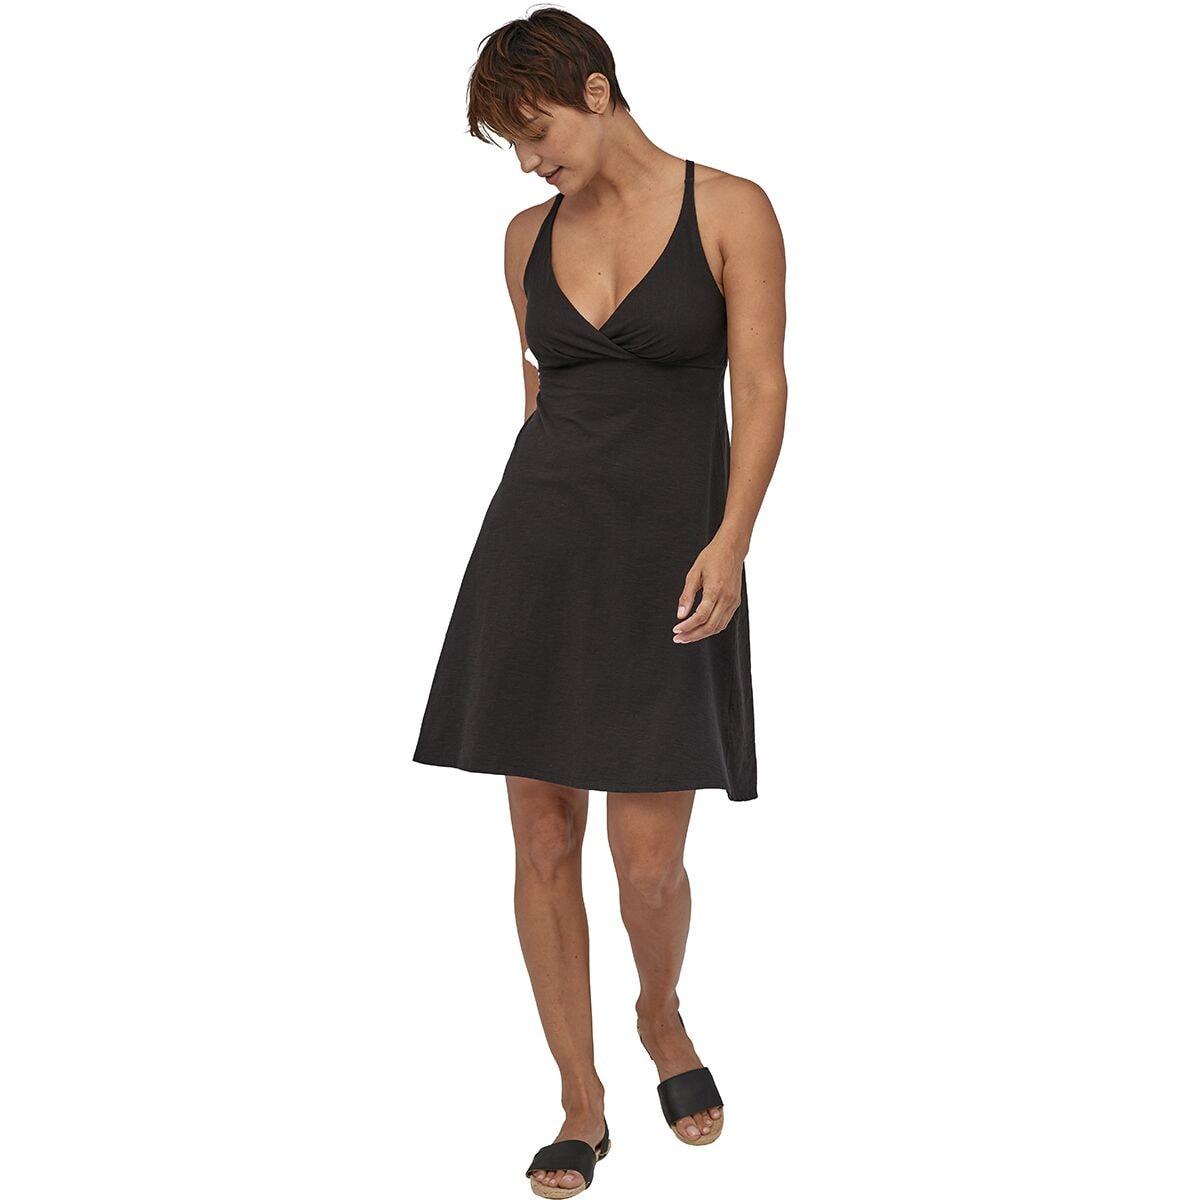 Patagonia Womens Ws Amber Dawn Dress Dress